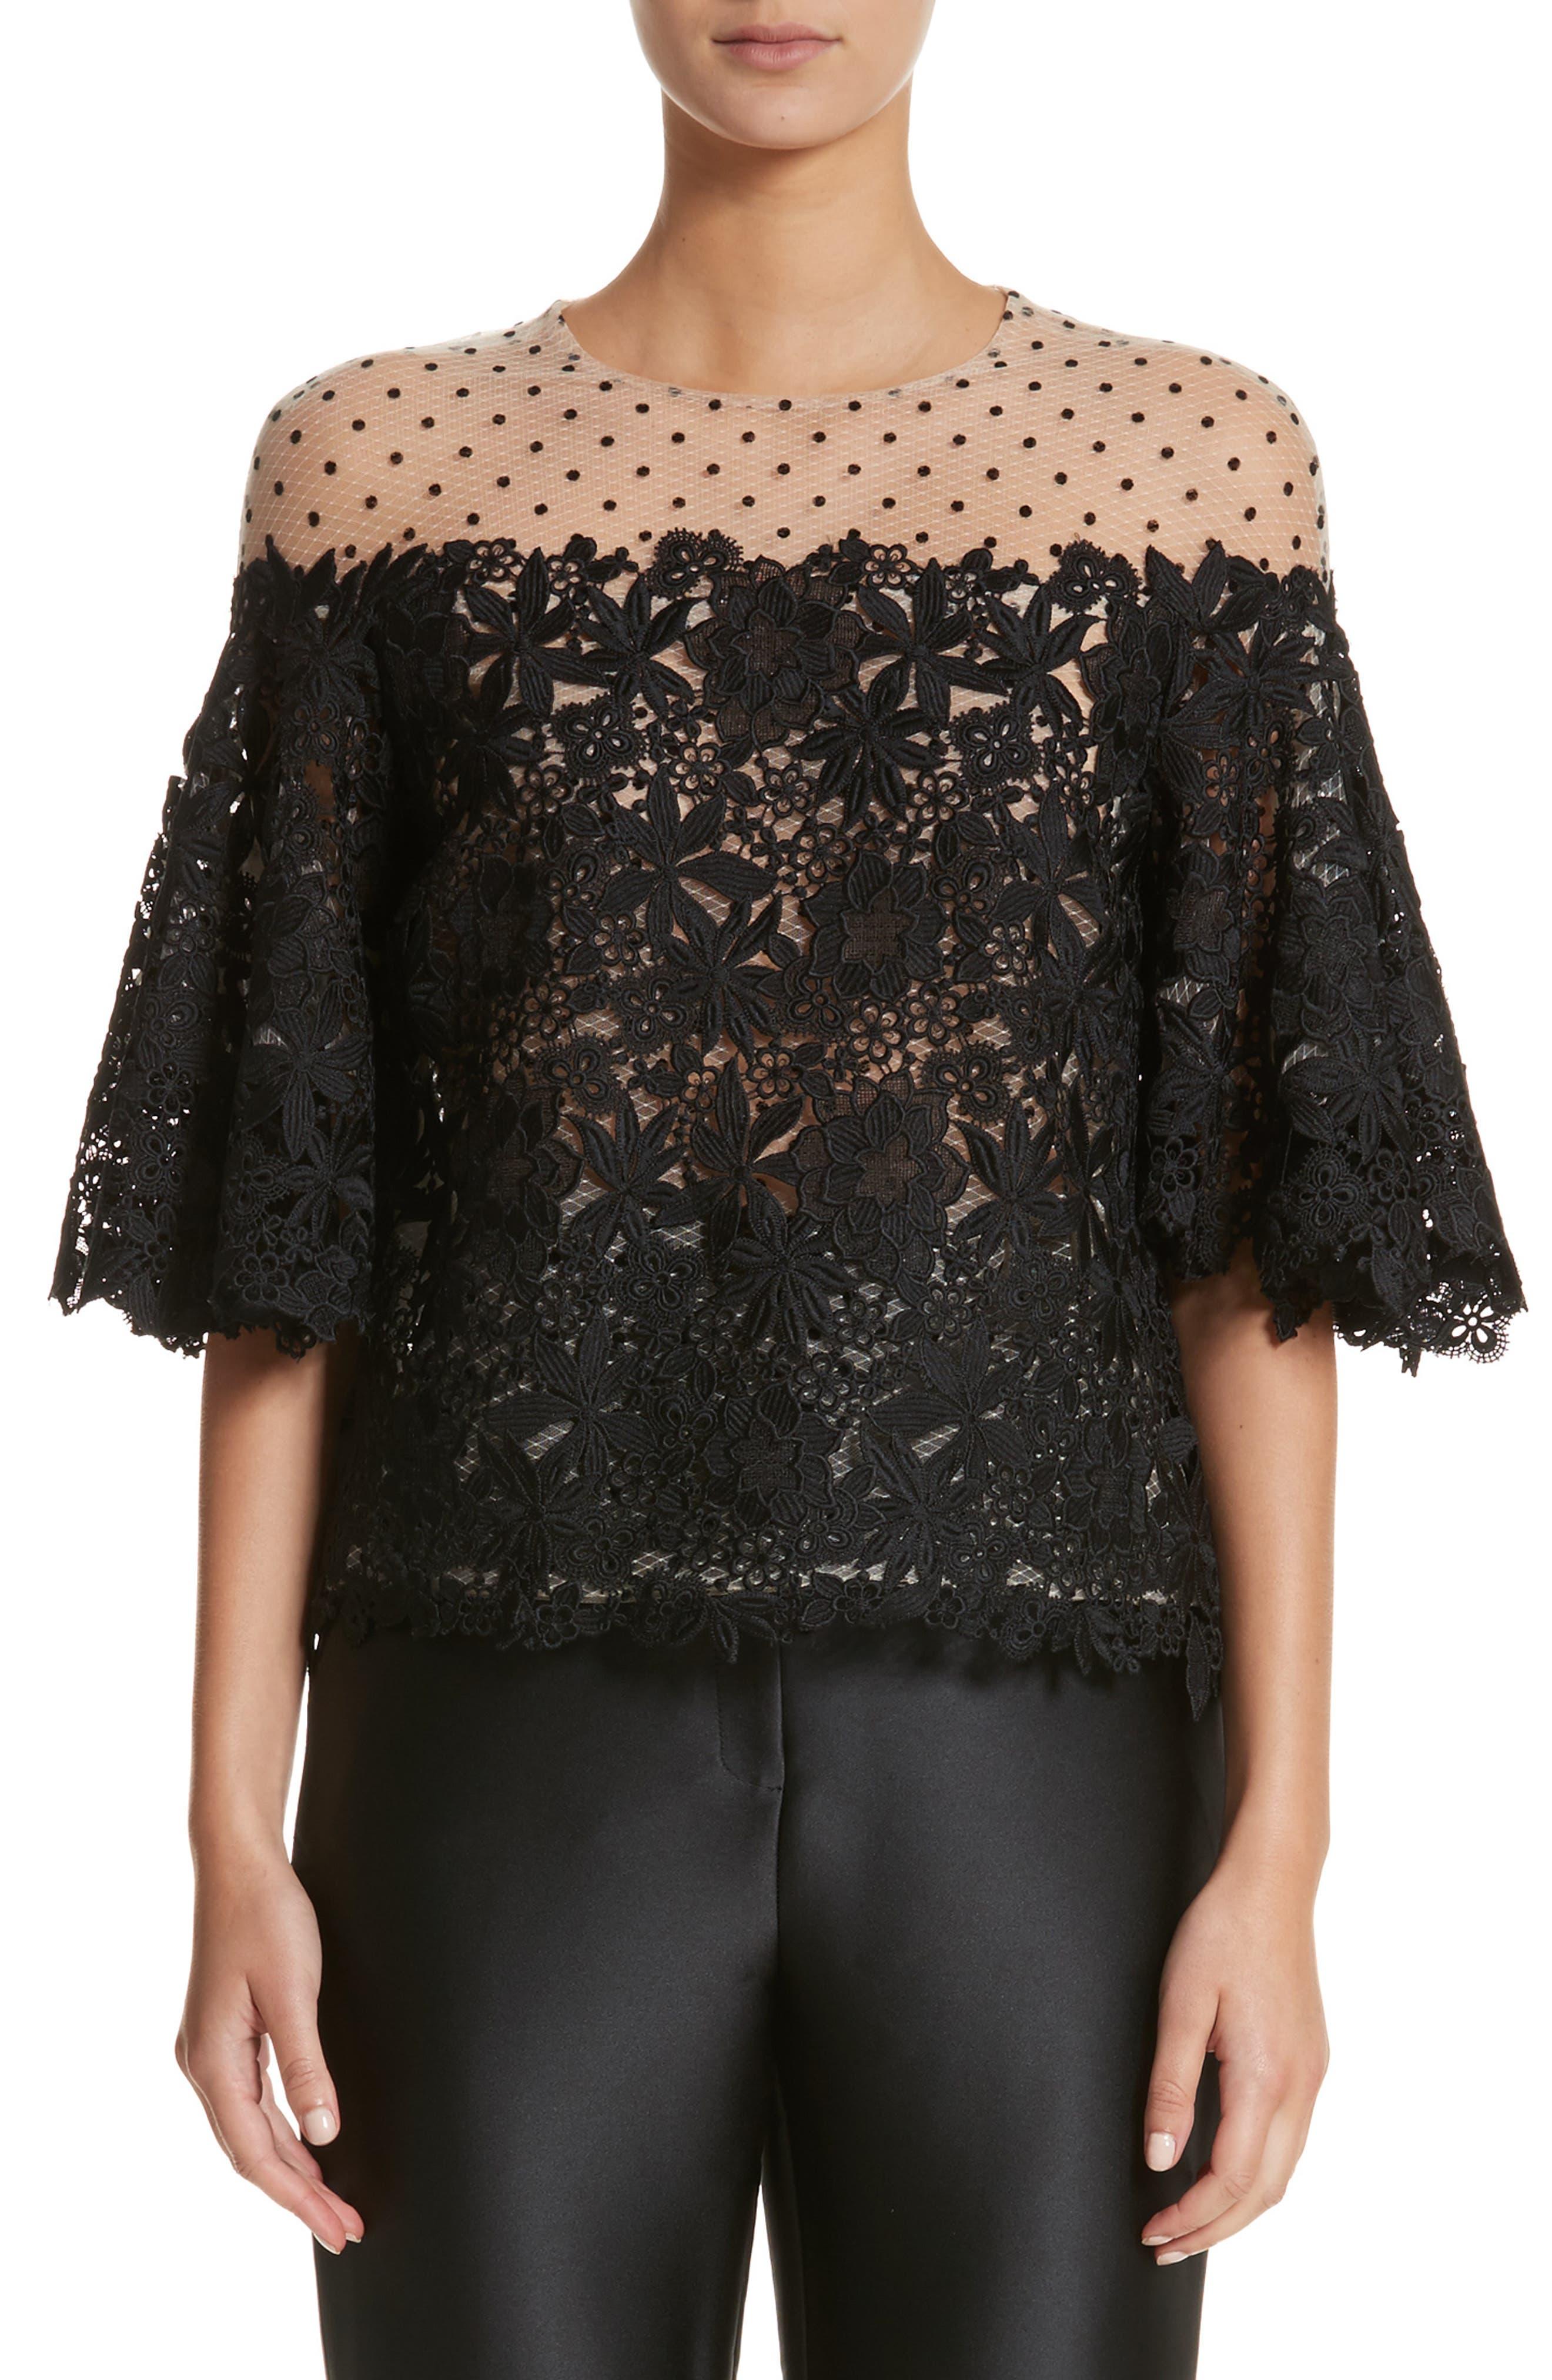 Alternate Image 1 Selected - Monique Lhuillier Lace & Dot Flutter Sleeve Top